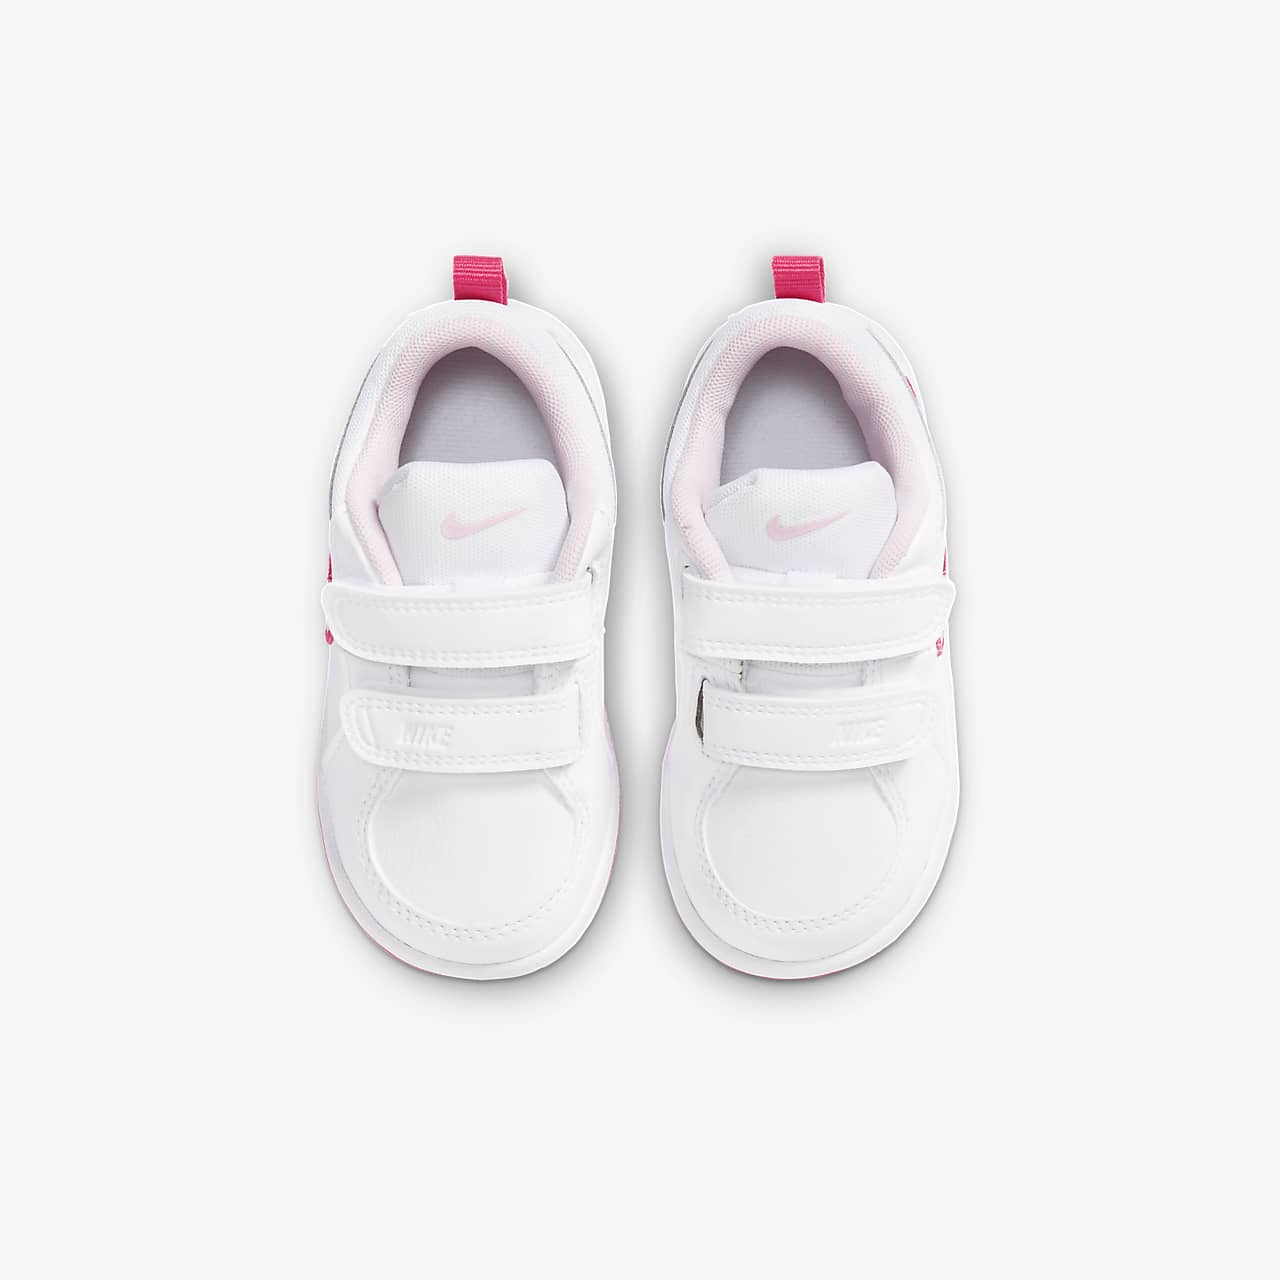 491cb68cf8f83 Chaussure Nike Pico 4 pour Bébé Petite fille. Nike.com FR